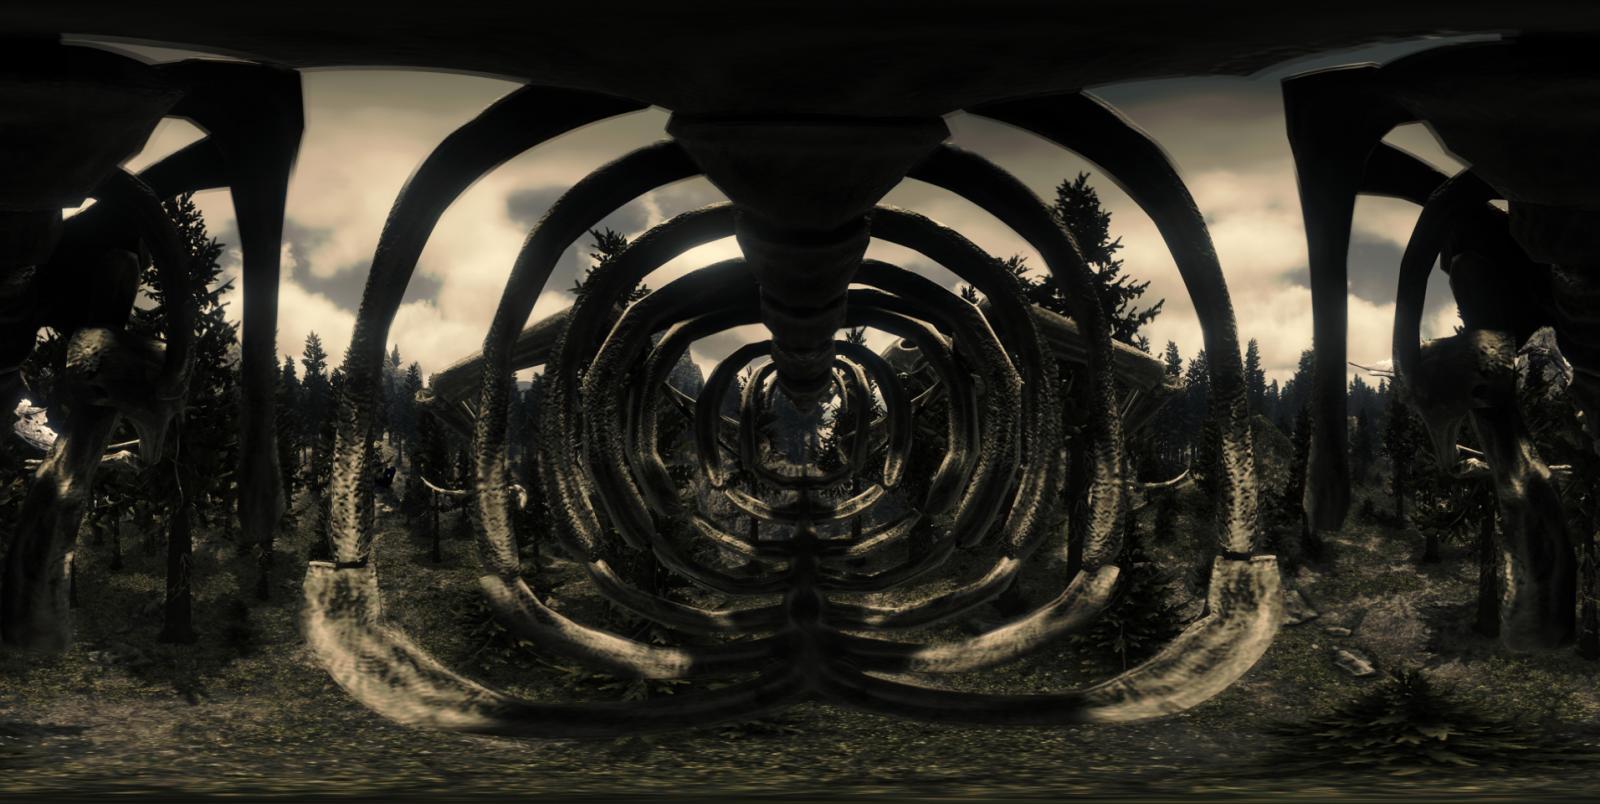 large.59175f10861ba_FataL1ty-DontLookBack-Panoramic360Stereoscopic3Dsta.jpg